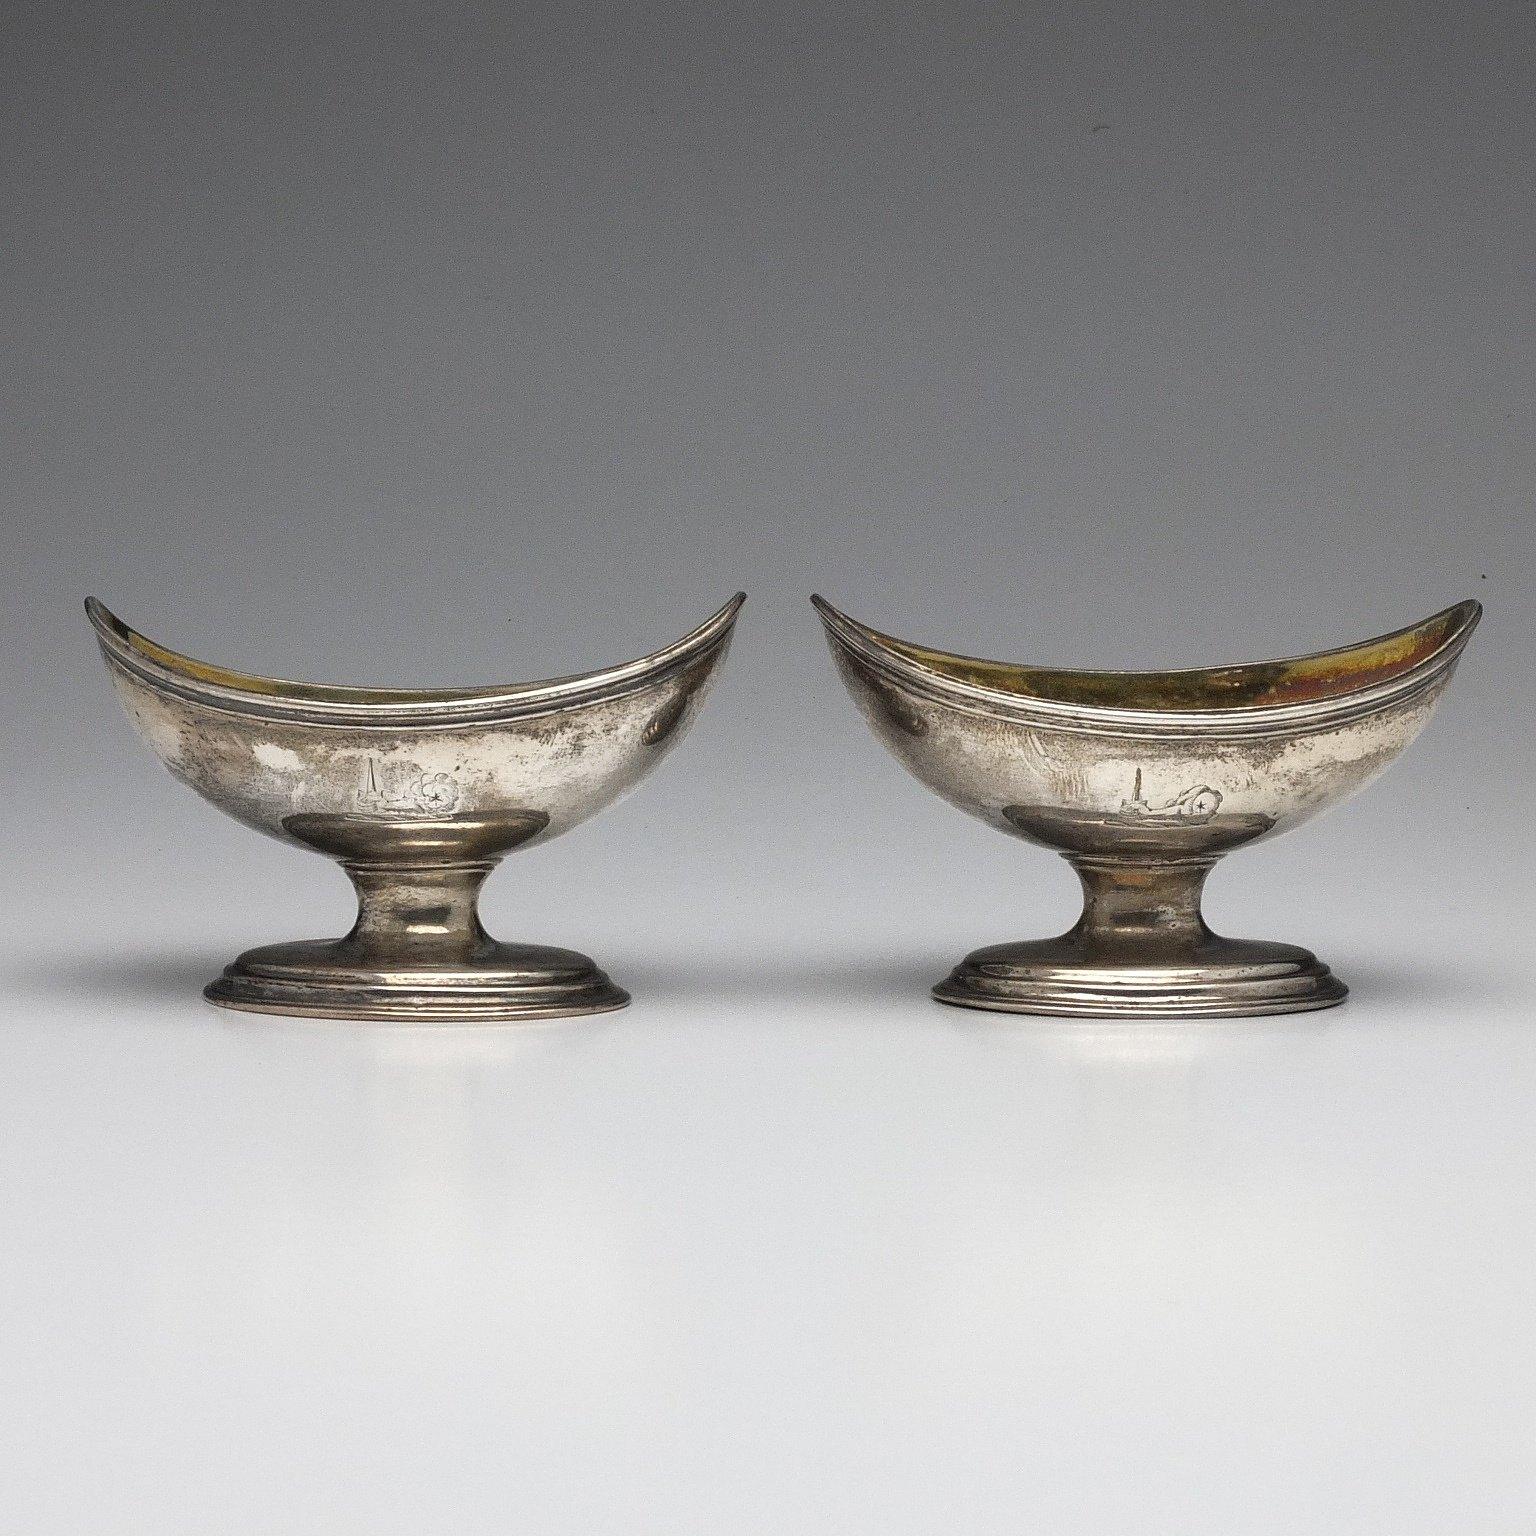 'Pair of George III Crested Sterling Silver Open Salts Joseph Wyatt London 1791'